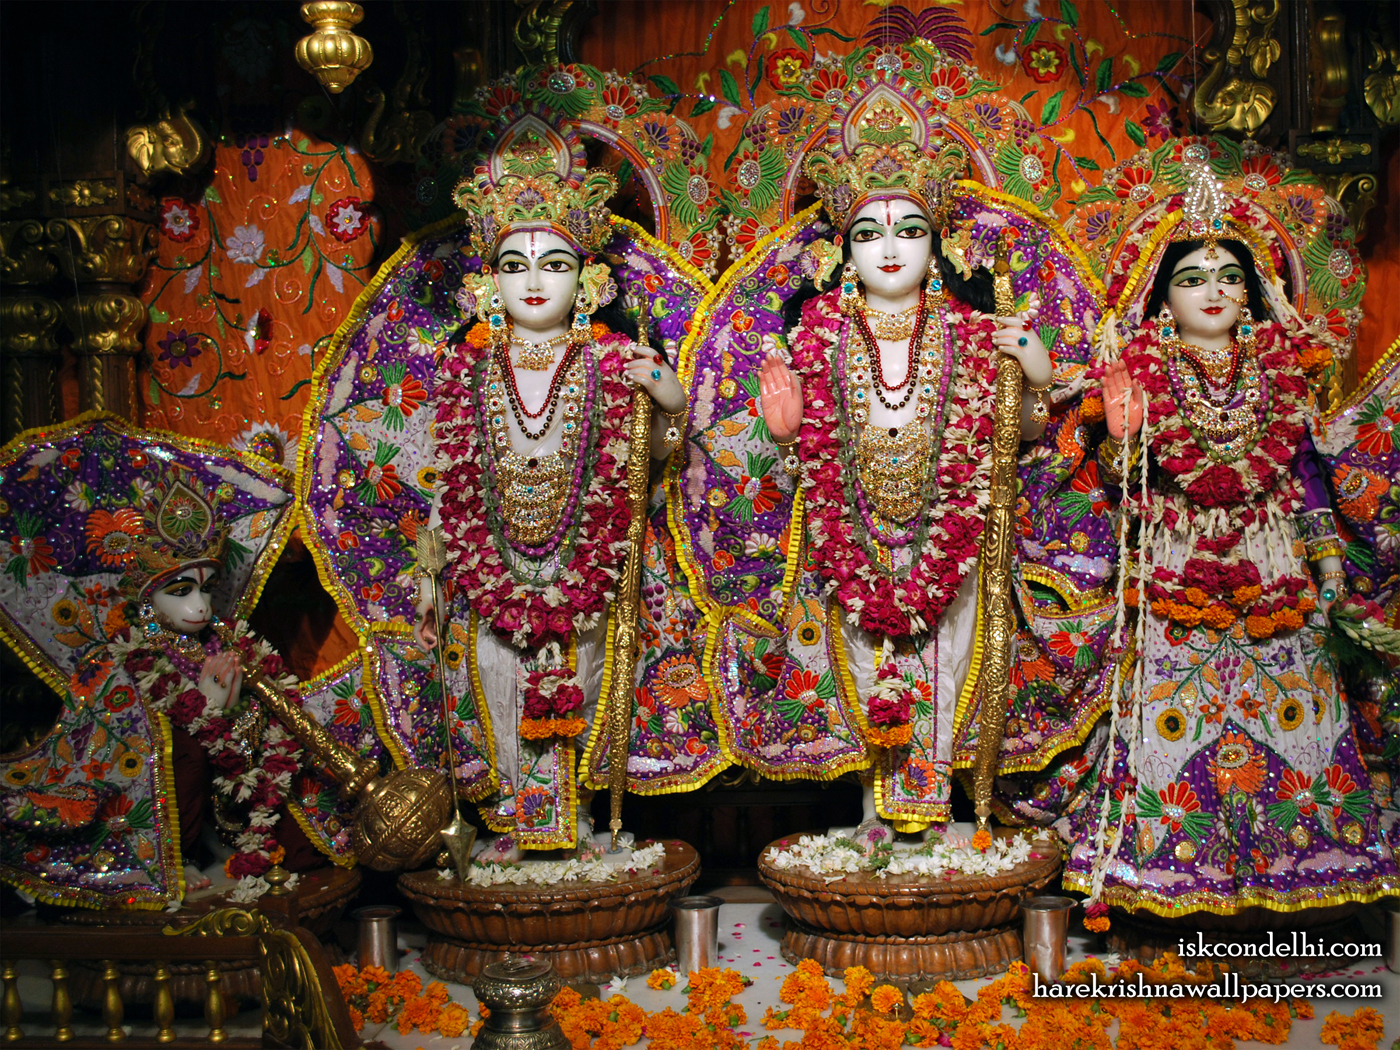 Sri Sri Sita Rama Laxman Hanuman Wallpaper (013) Size 1400x1050 Download